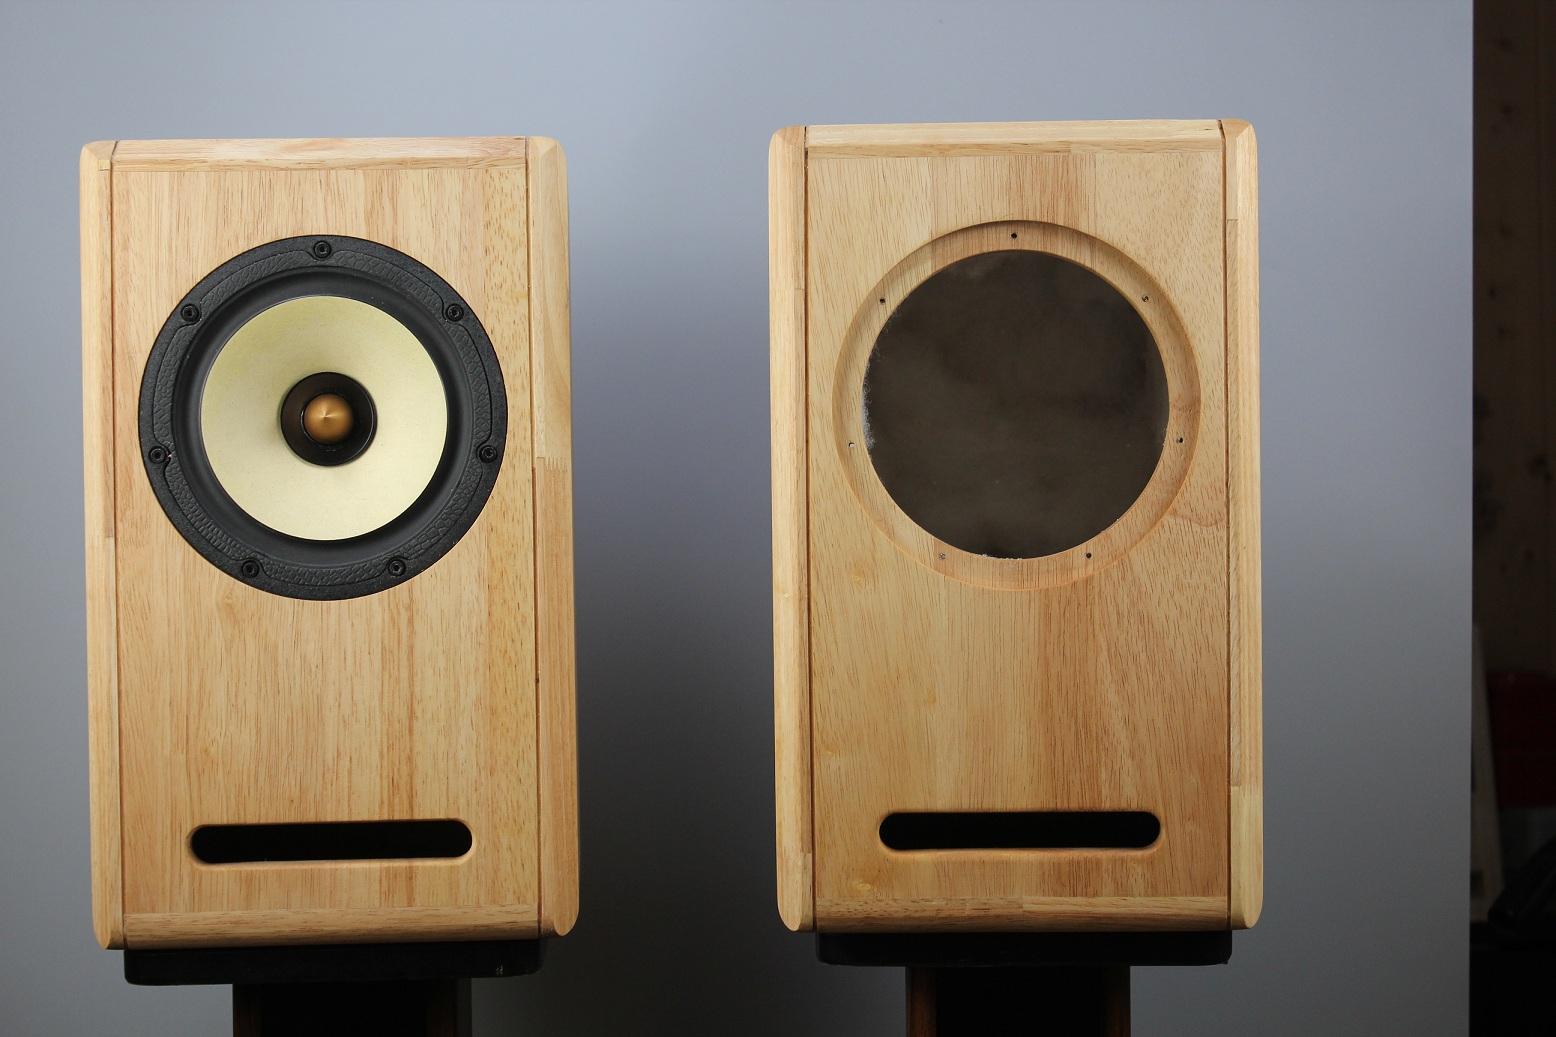 Solid Wood Full Frequency Labyrinth Speaker 6 5 Inch Empty Box Diy Custom Transmission Line Full Range Speaker Empty Box